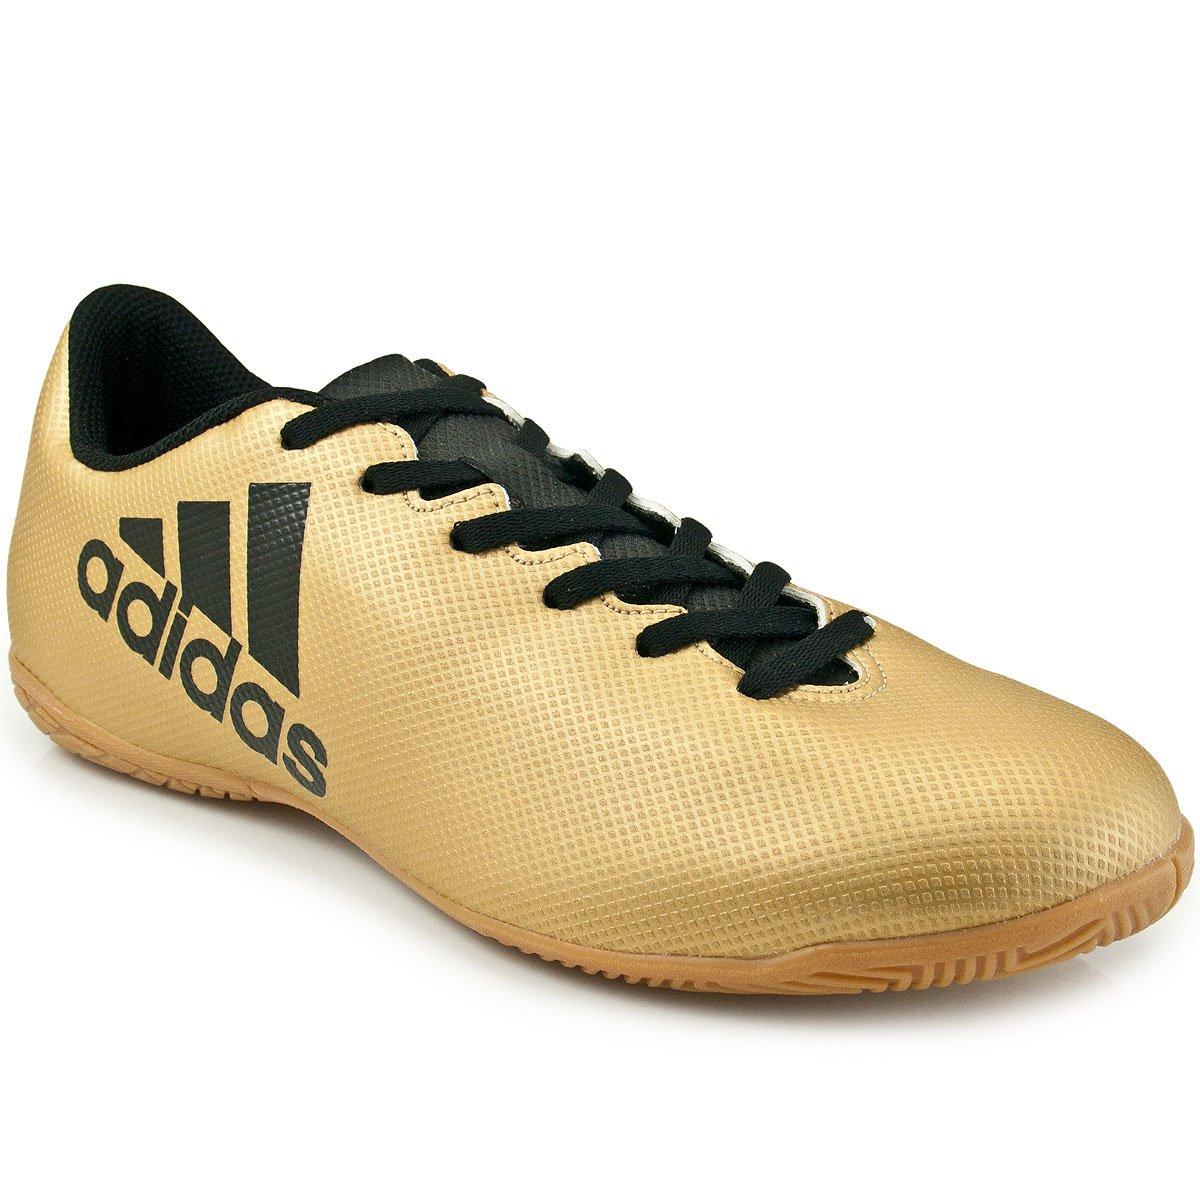 80b3bc5b24 Chuteira Adidas X 17.4 IN